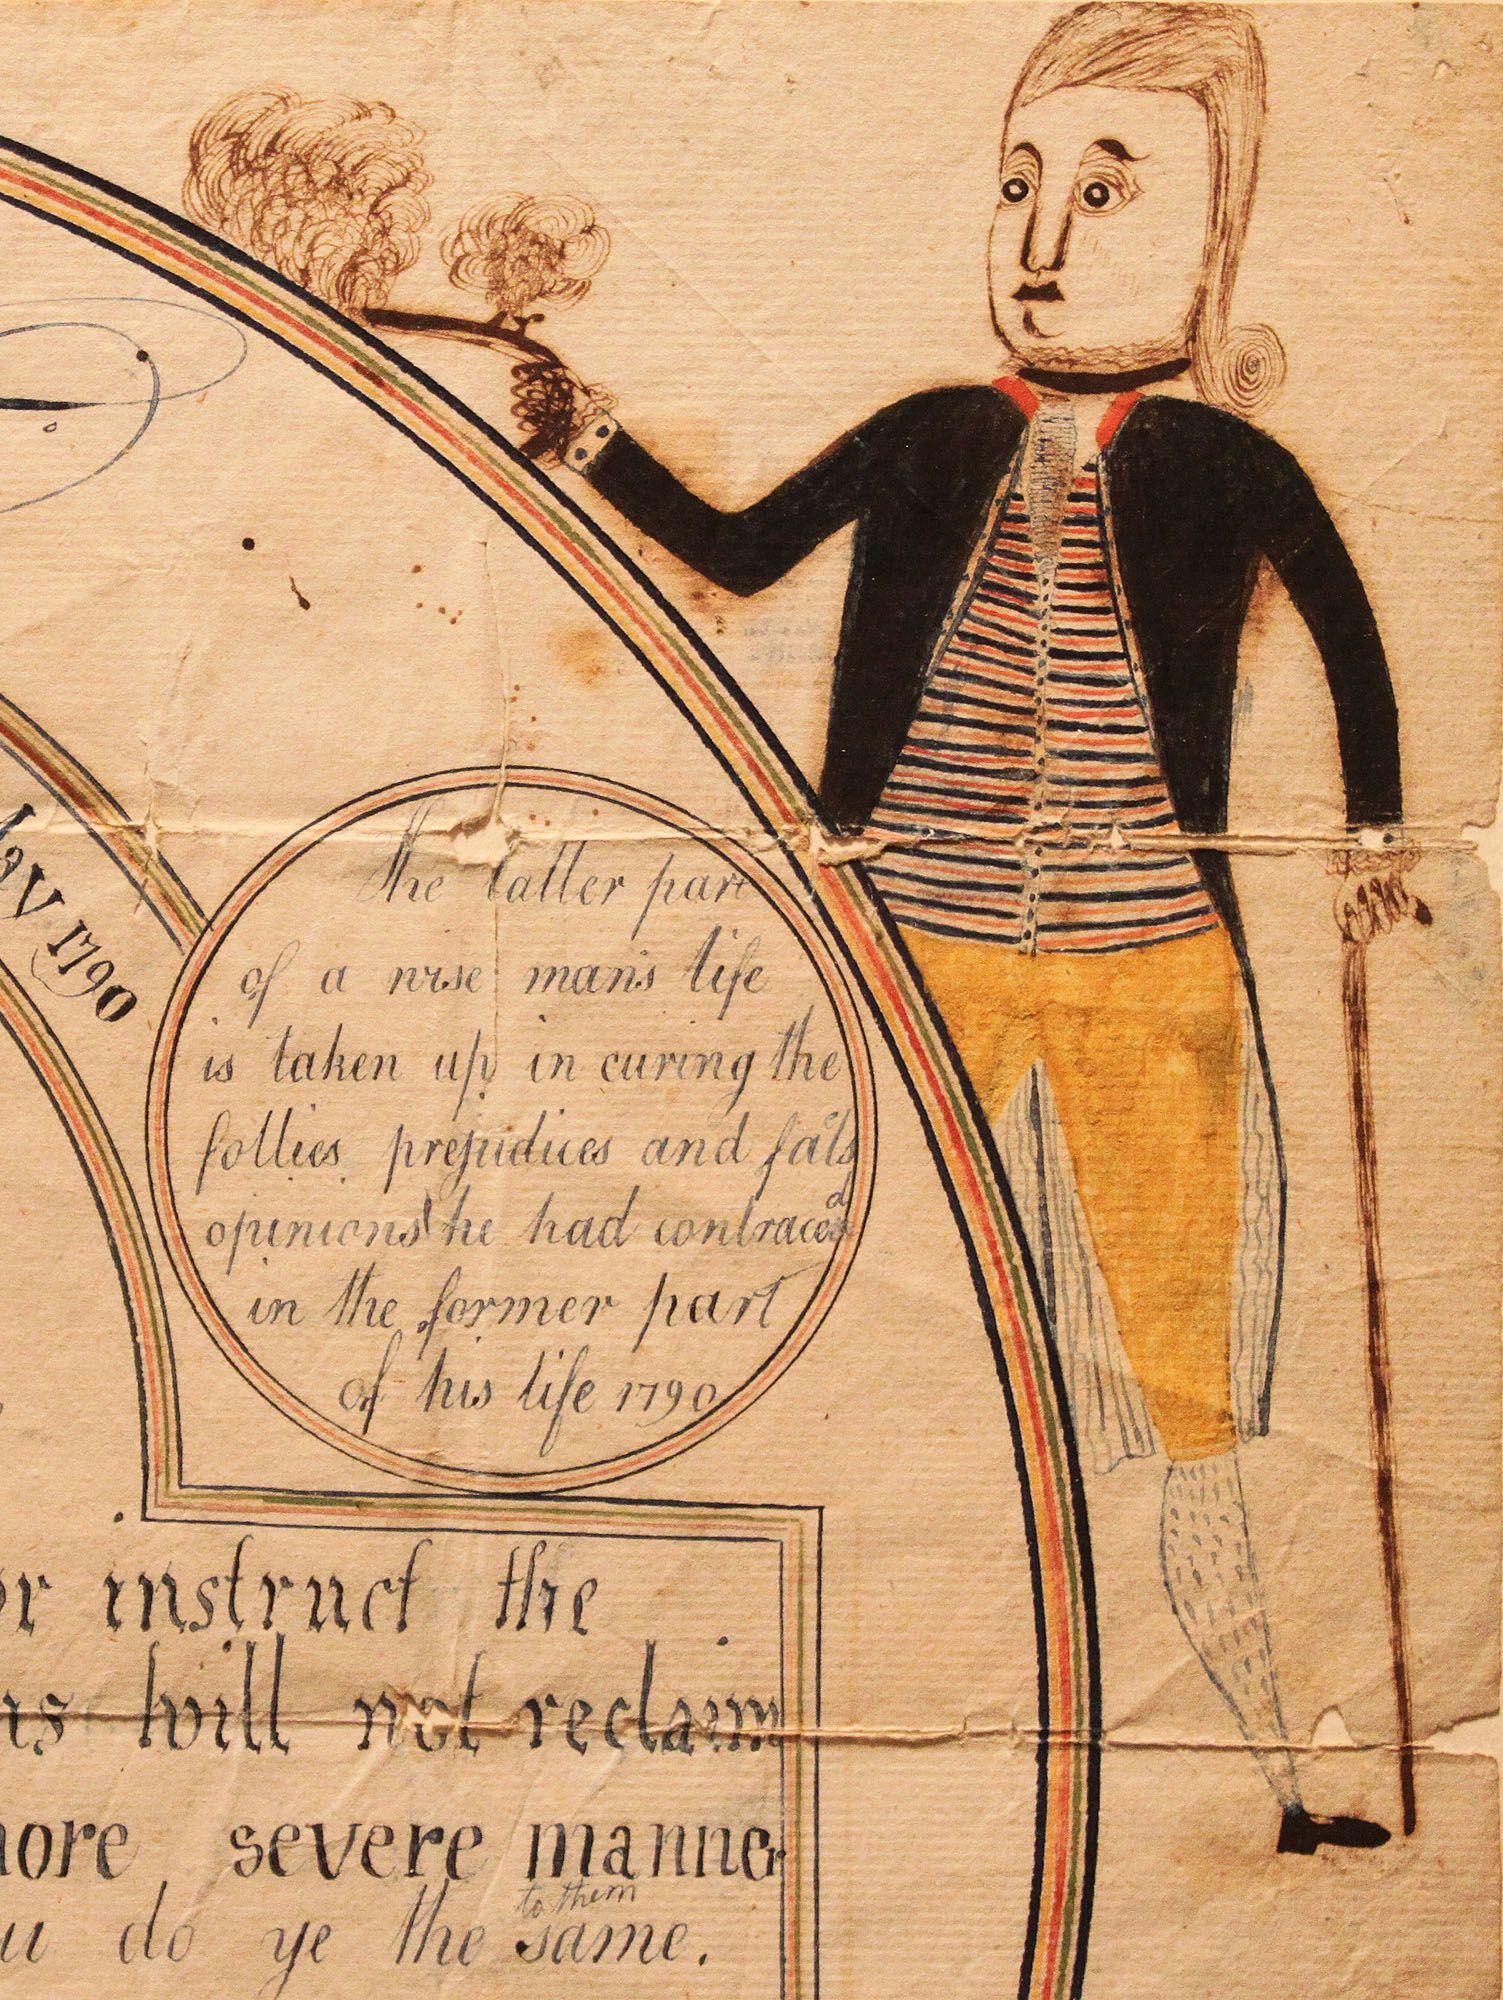 View 1 Post American Revolution Illuminated Manuscript Signed